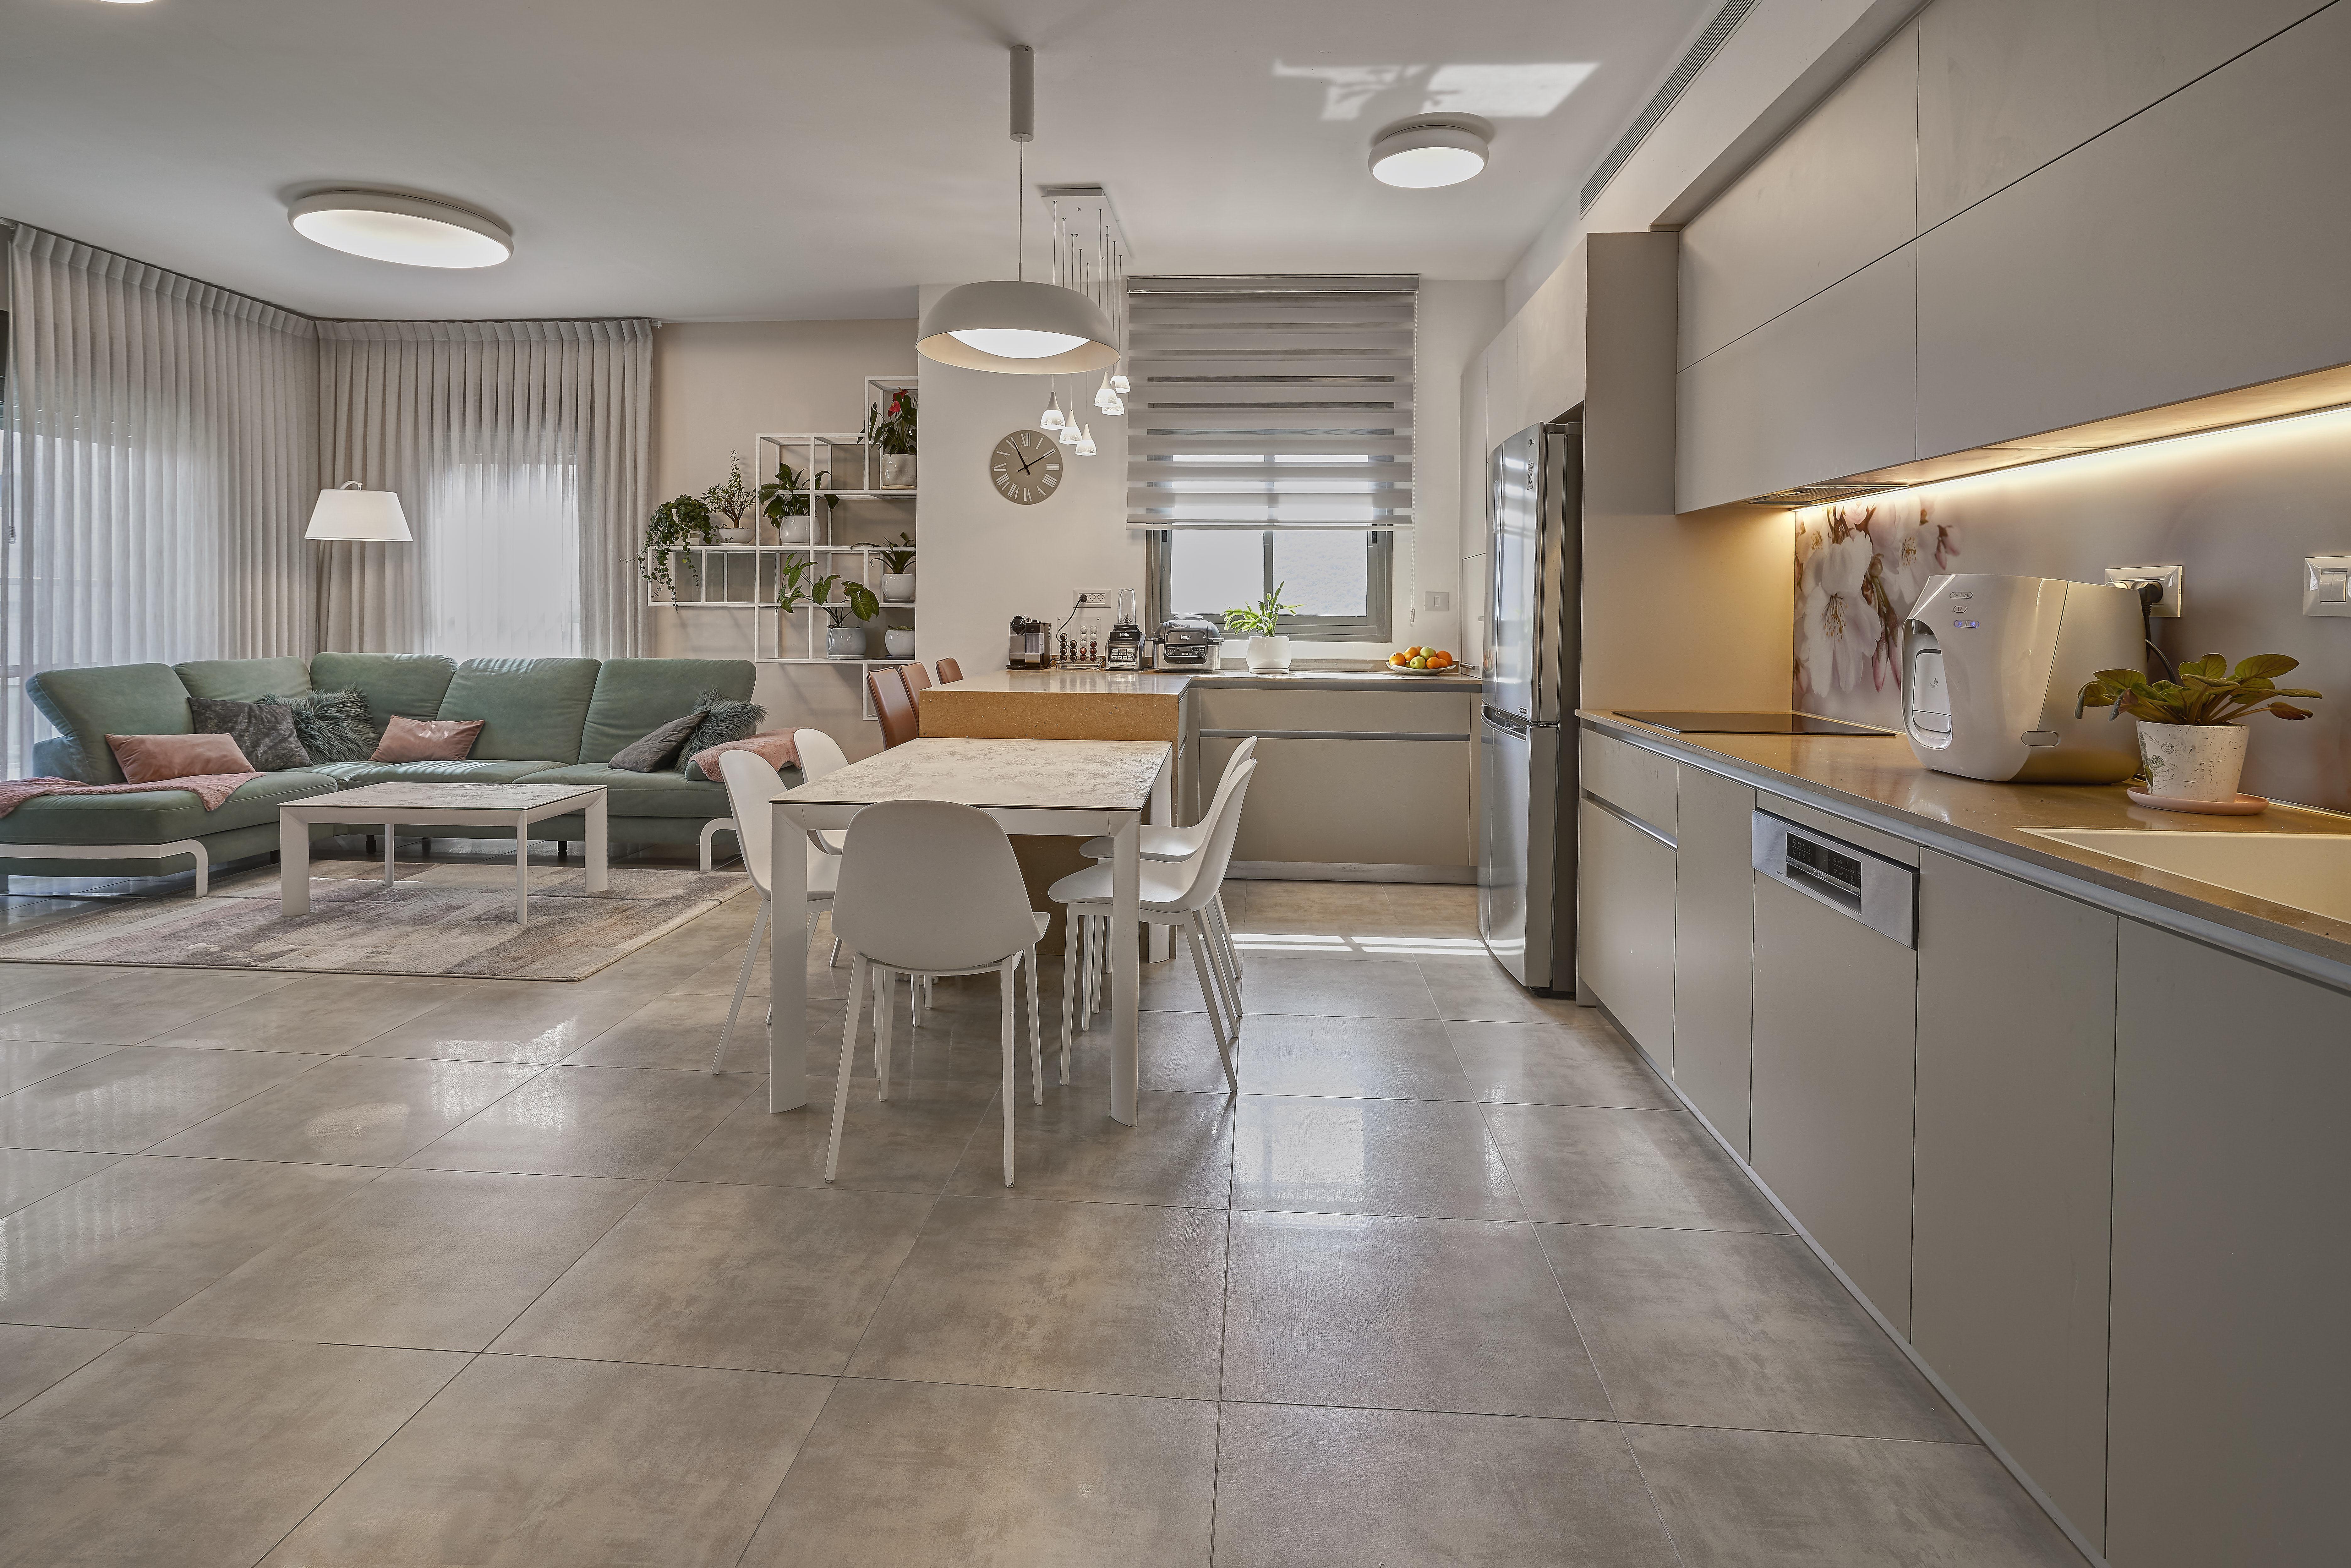 Living Room and Kitchen Design, עיצוב מטבח וסלון